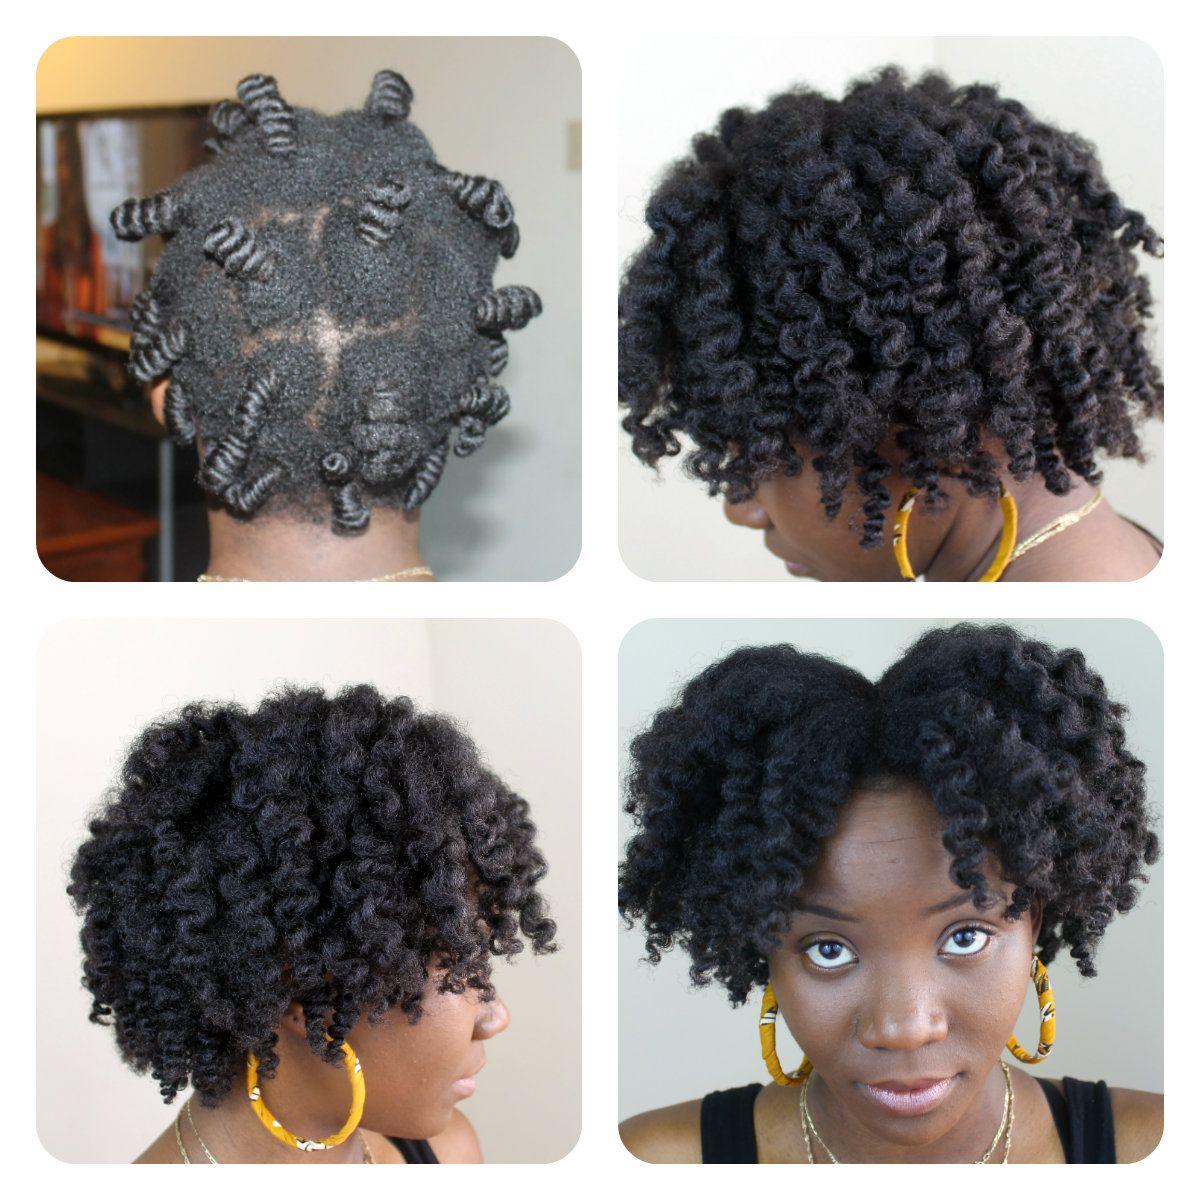 Sibongile 4c Natural Hair Style Icon Short Natural Hair Styles 4c Natural Hair Hair Inspiration